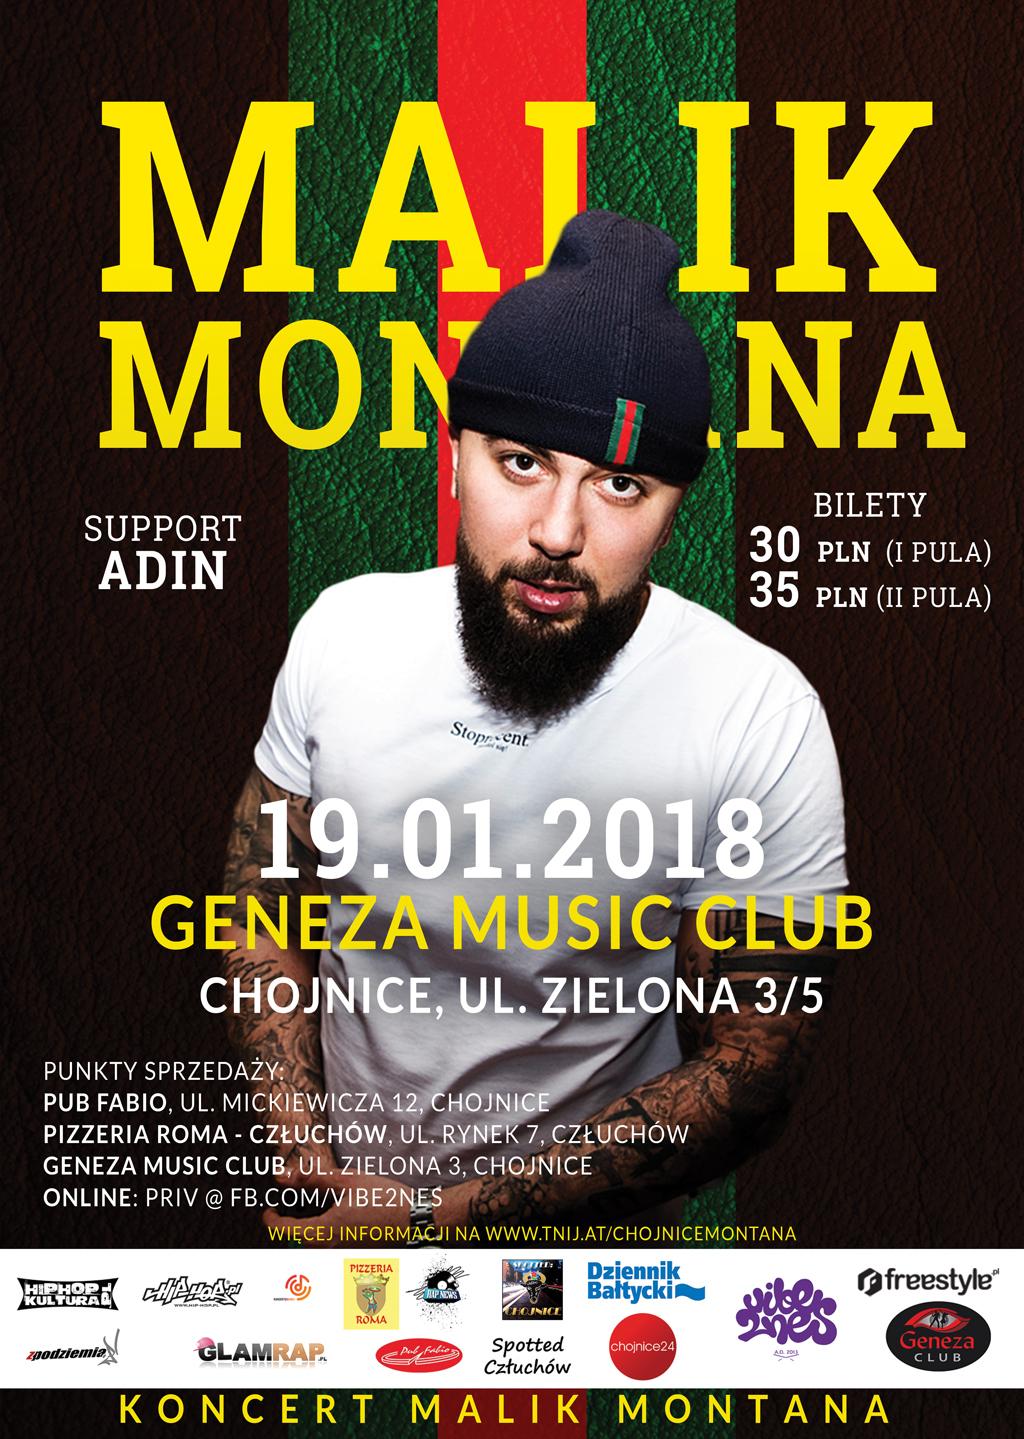 Koncert Malika Montana w Chojnicach